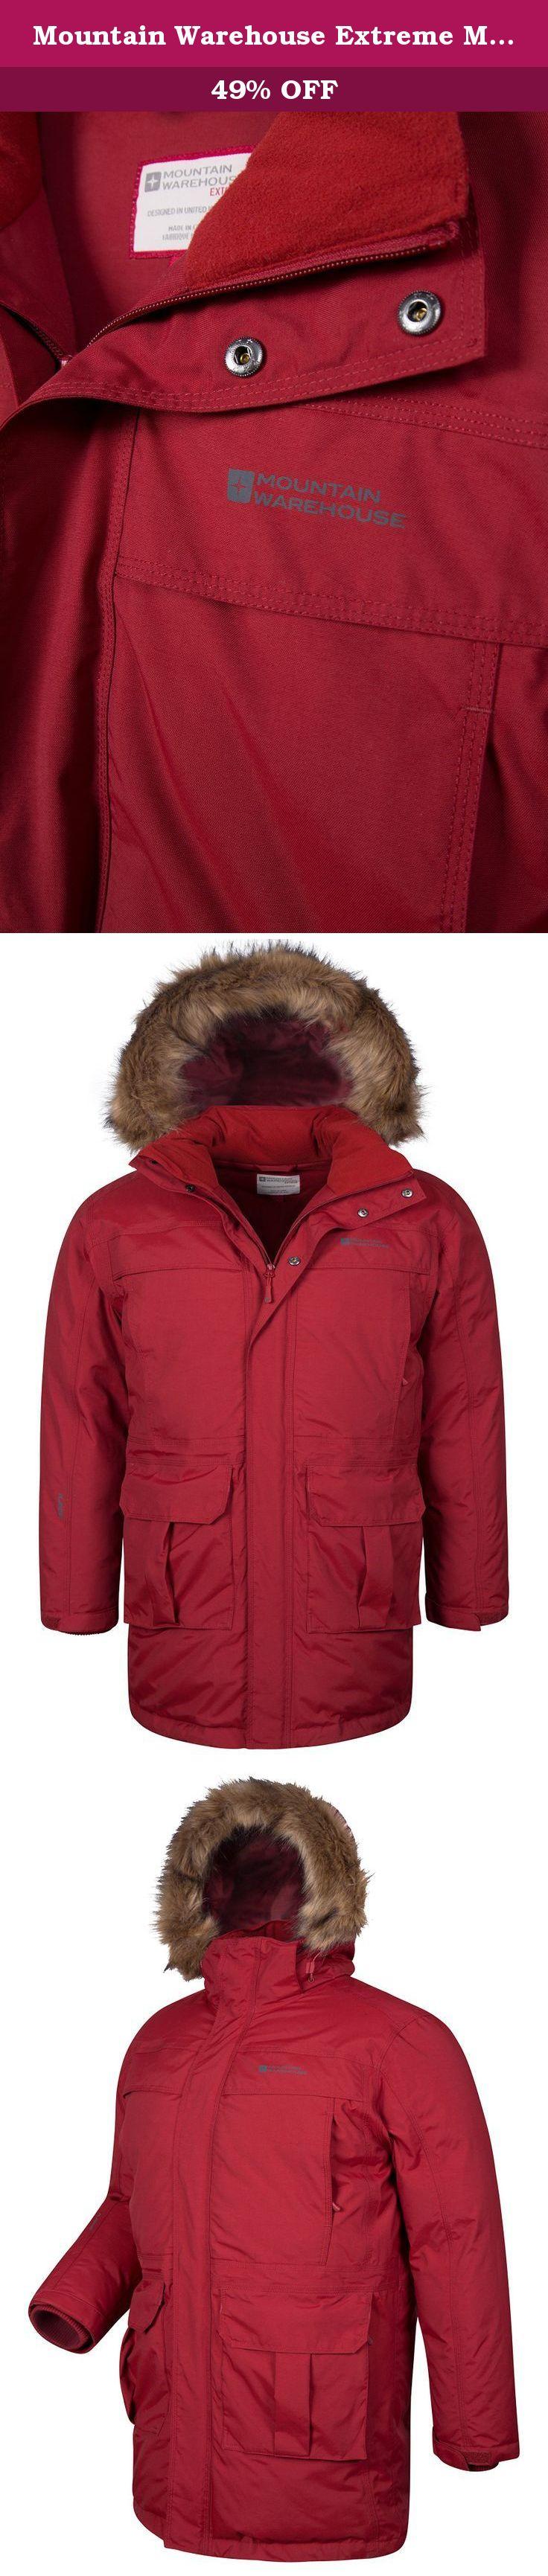 fe3a032cb Mountain Warehouse Extreme Mens Down Jacket + Fur Trim Hood Burgundy ...